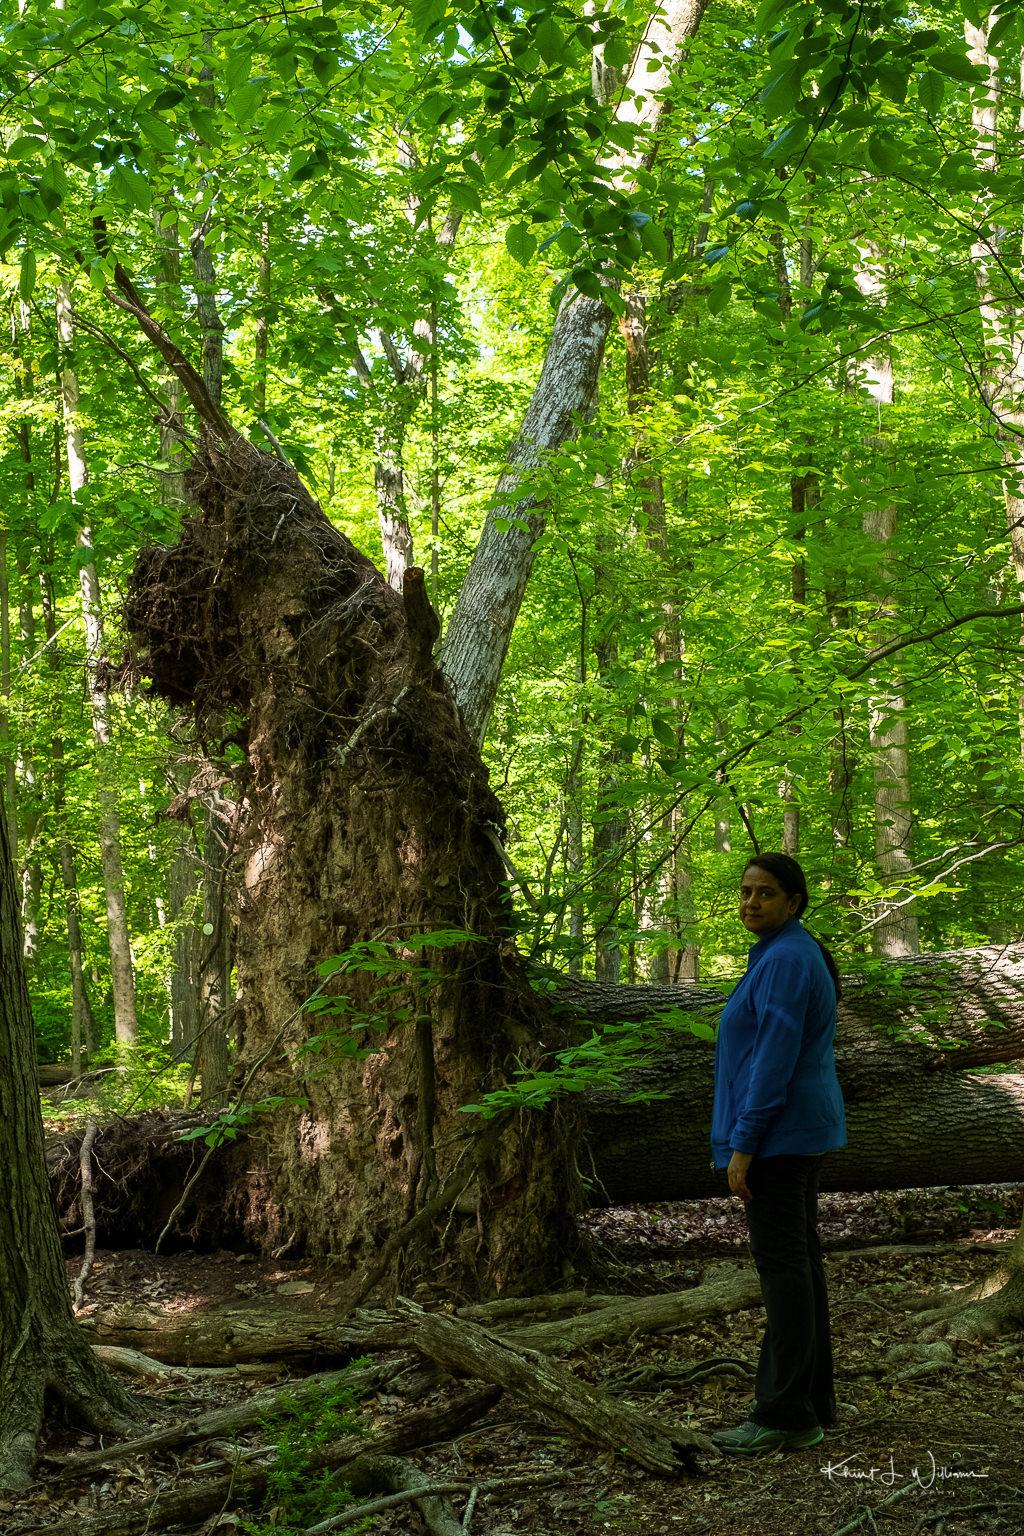 Bhavna standing next to a fallen tree stump